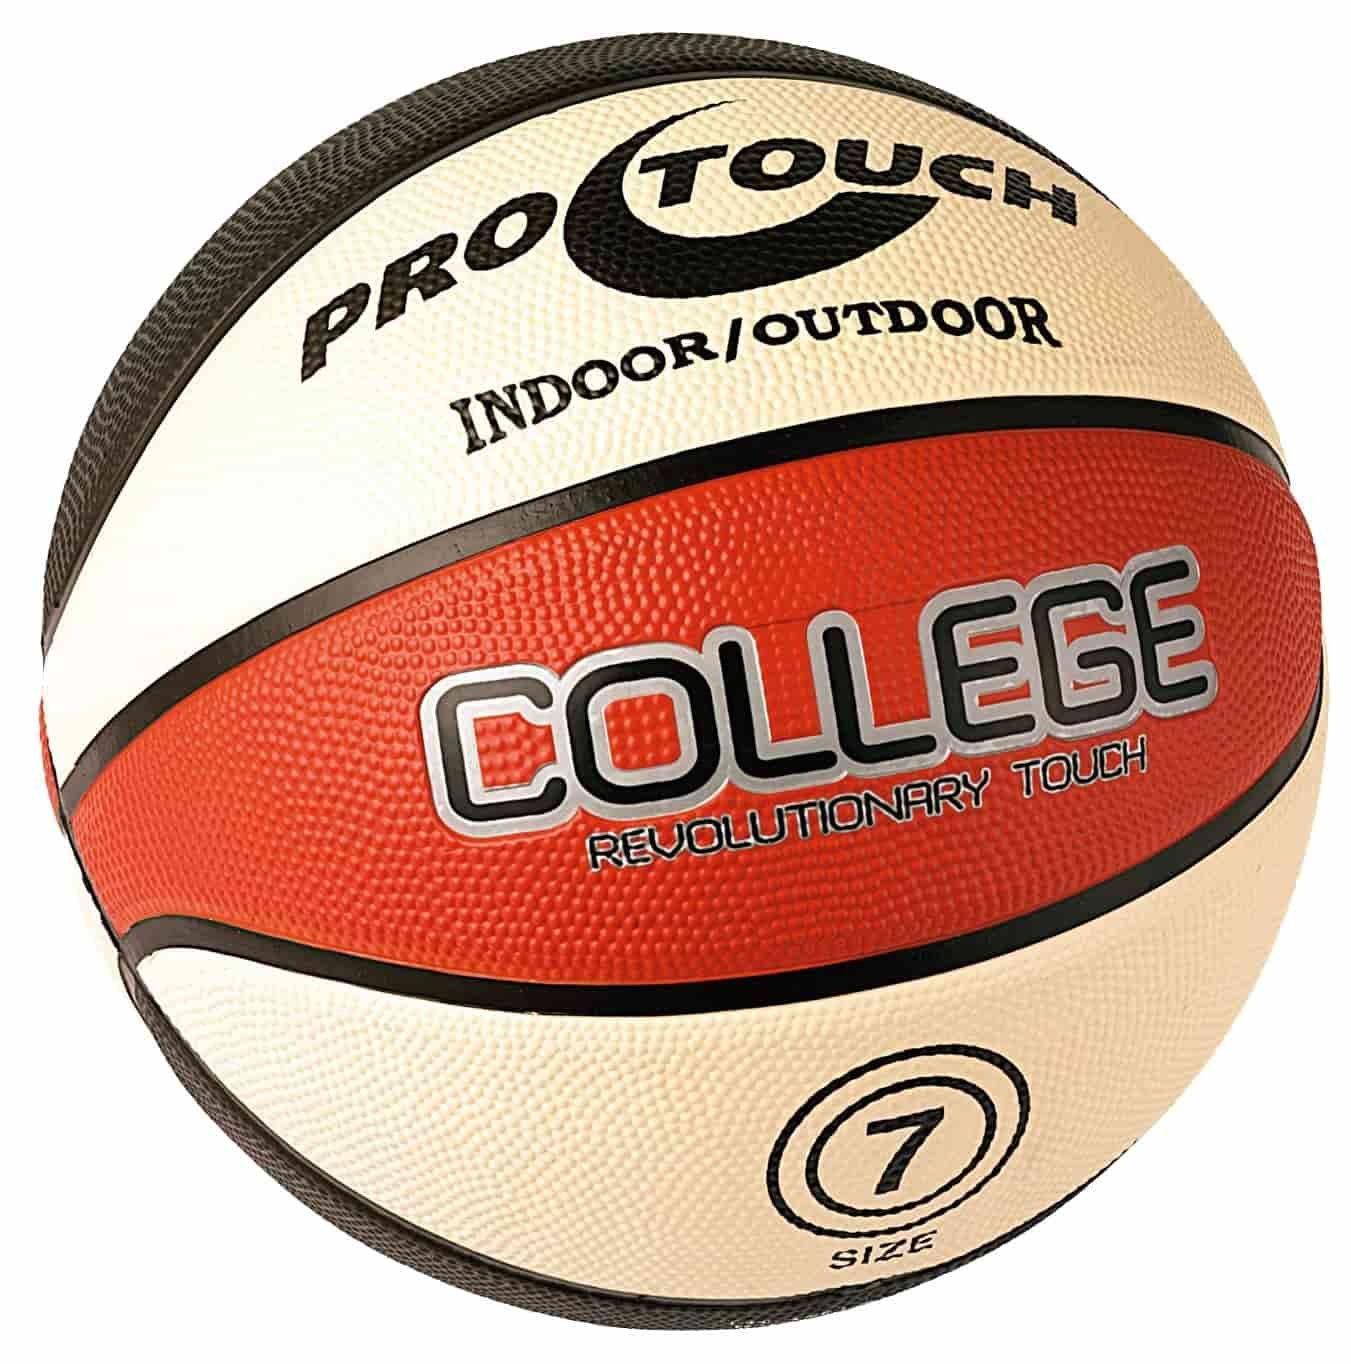 Pro Touch Basketbal College veľkosť (size) 7